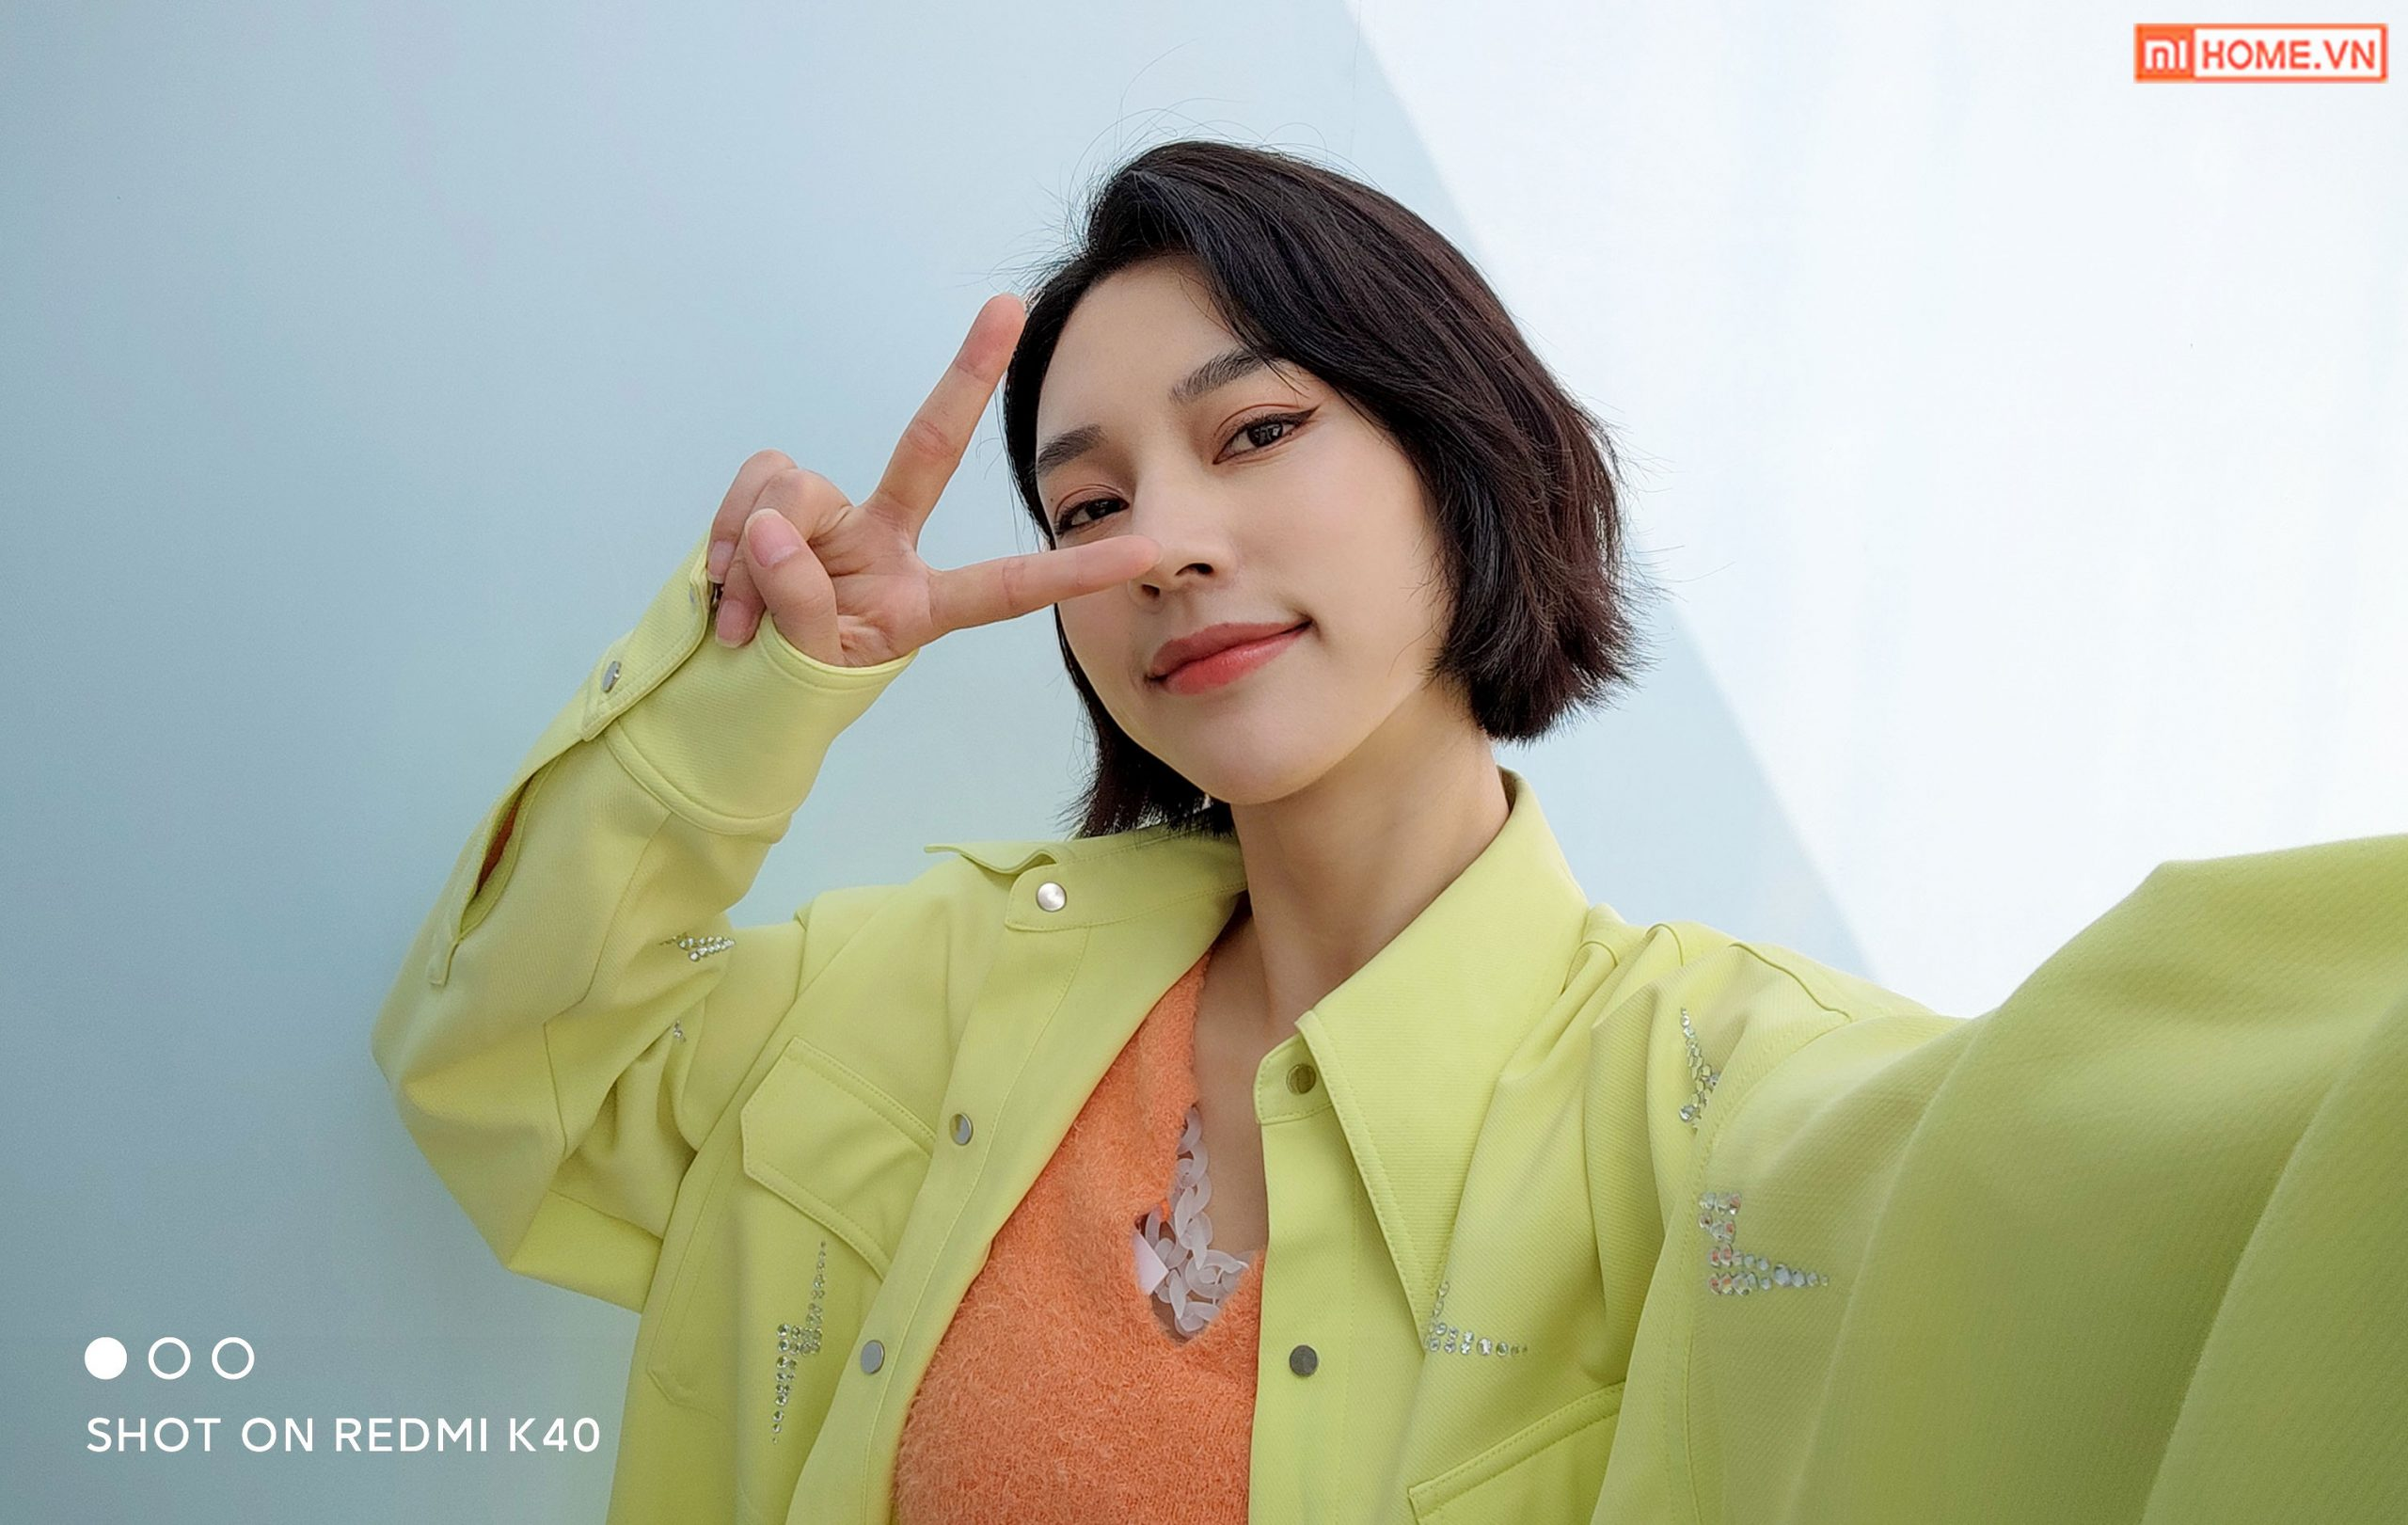 Xiaomi Redmi K40 21 scaled